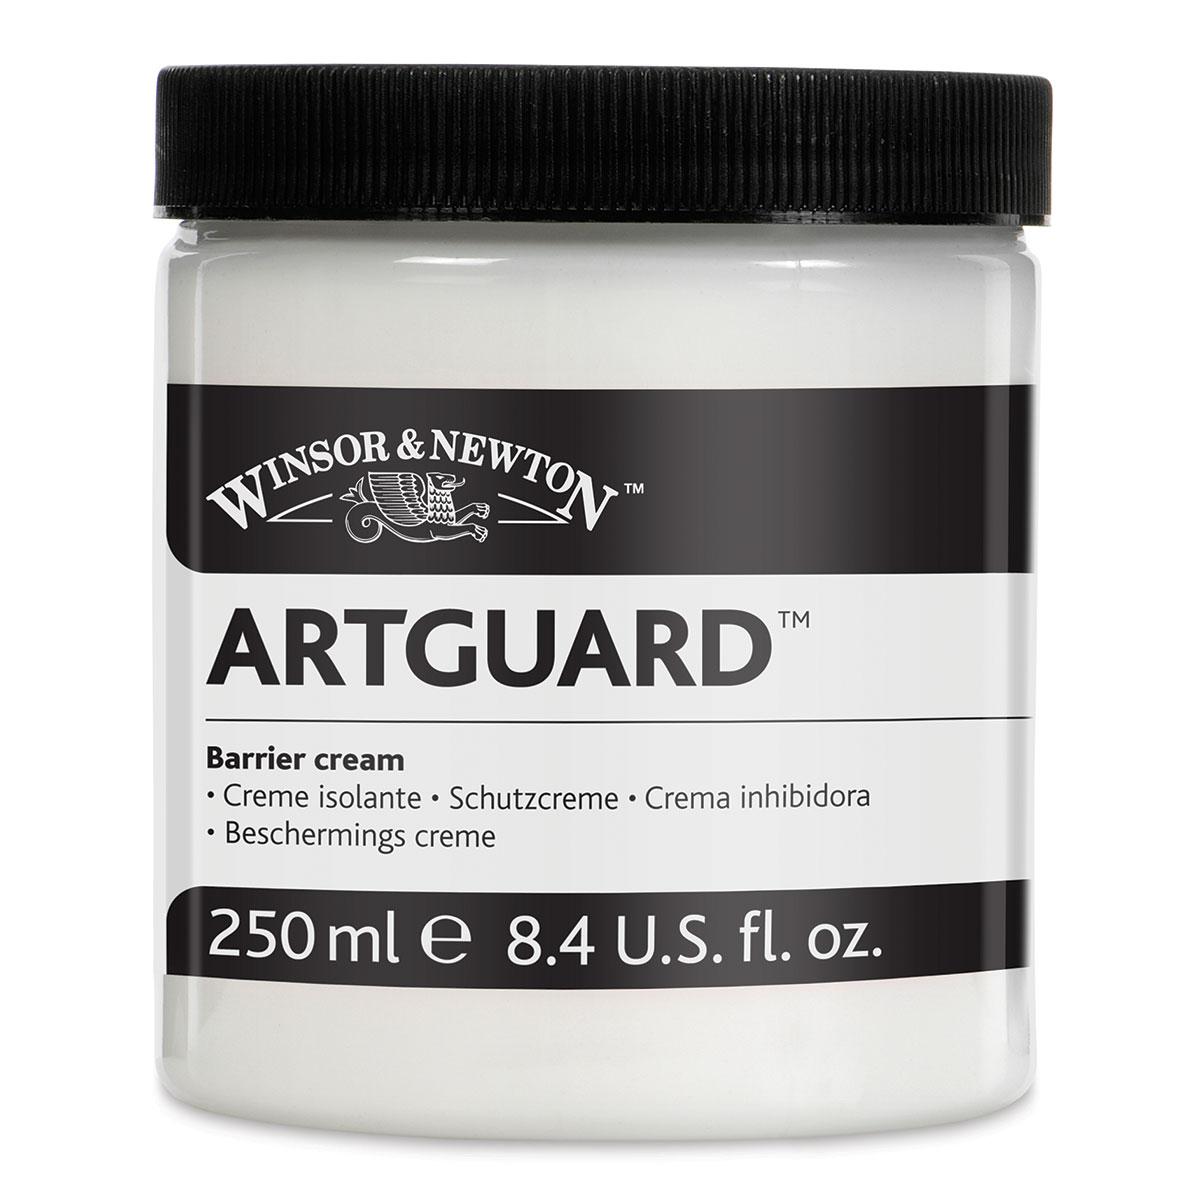 Winsor & Newton Artguard Barrier Cream - 250 ml Jar